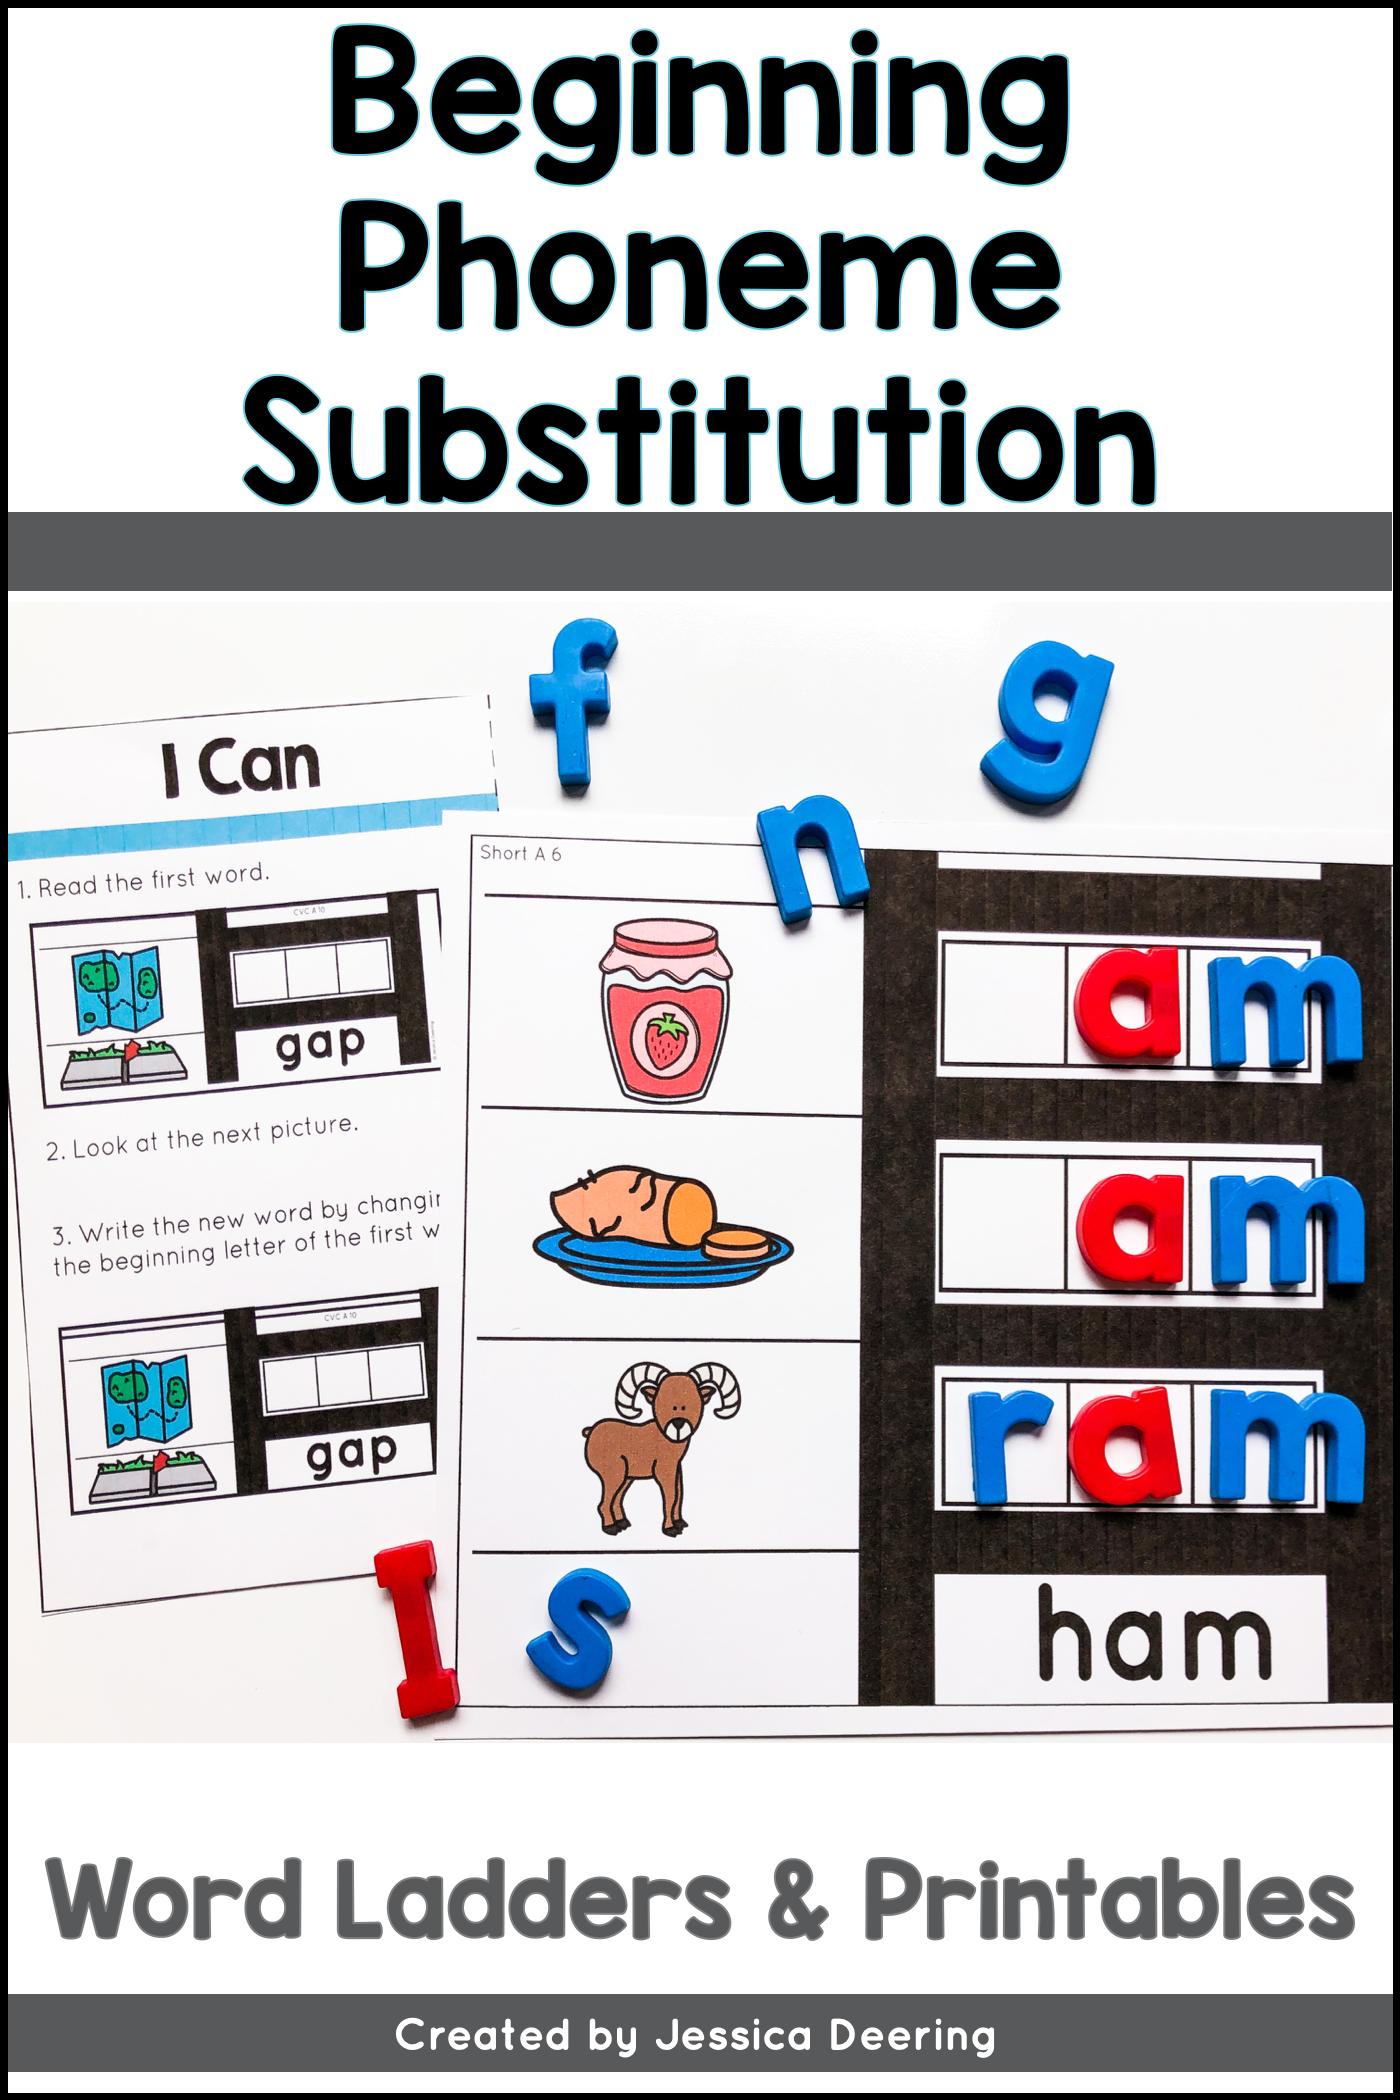 Phoneme Substitution Activities Change A Beginning Sound Phoneme Substitution Activities Phonemic Awareness Activities Phonemic Awareness Skills [ 2100 x 1400 Pixel ]